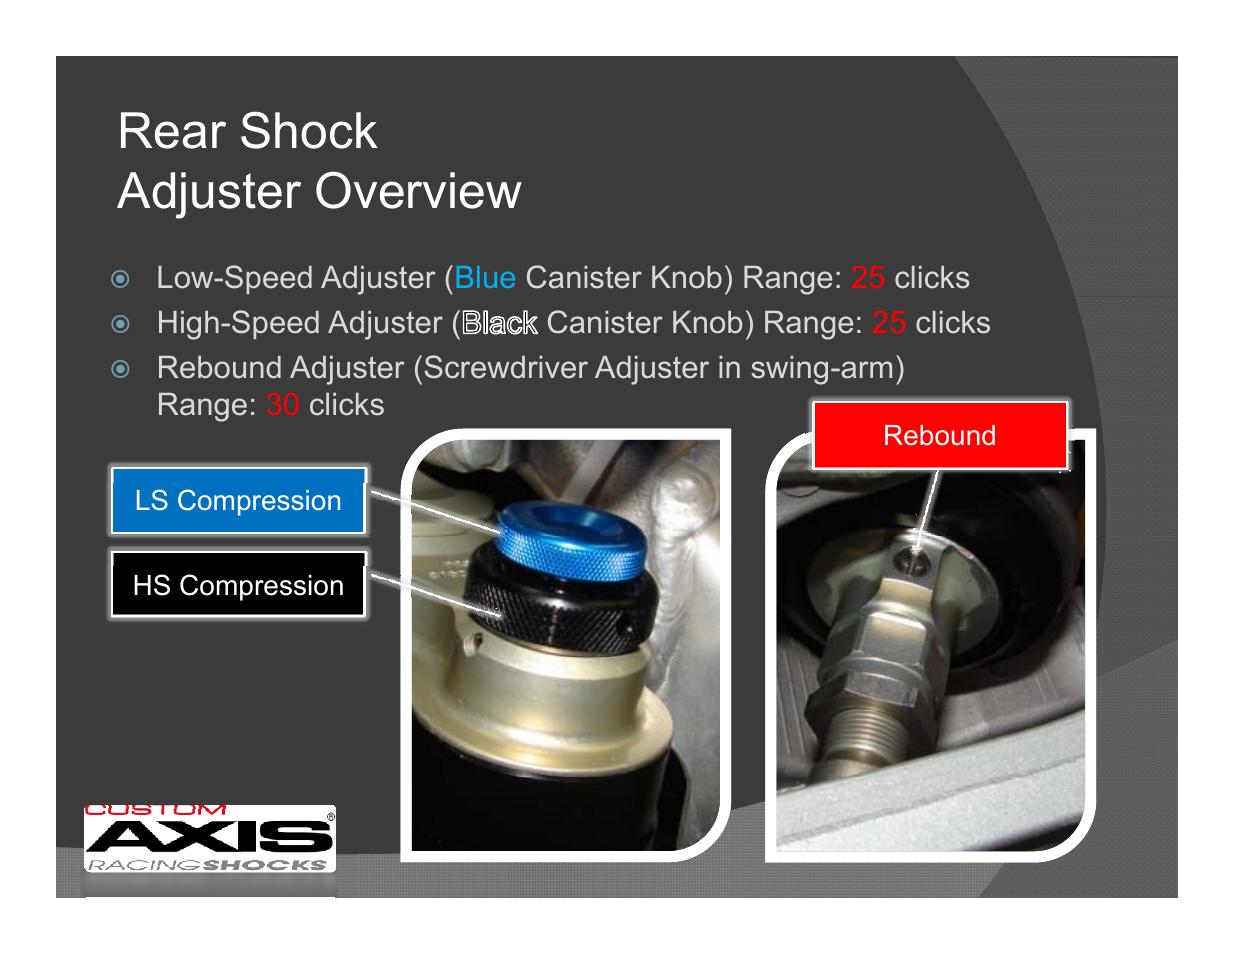 Penske Racing Shocks MX REAR SHOCK (CUSTOM AXIS) User Manual | Page